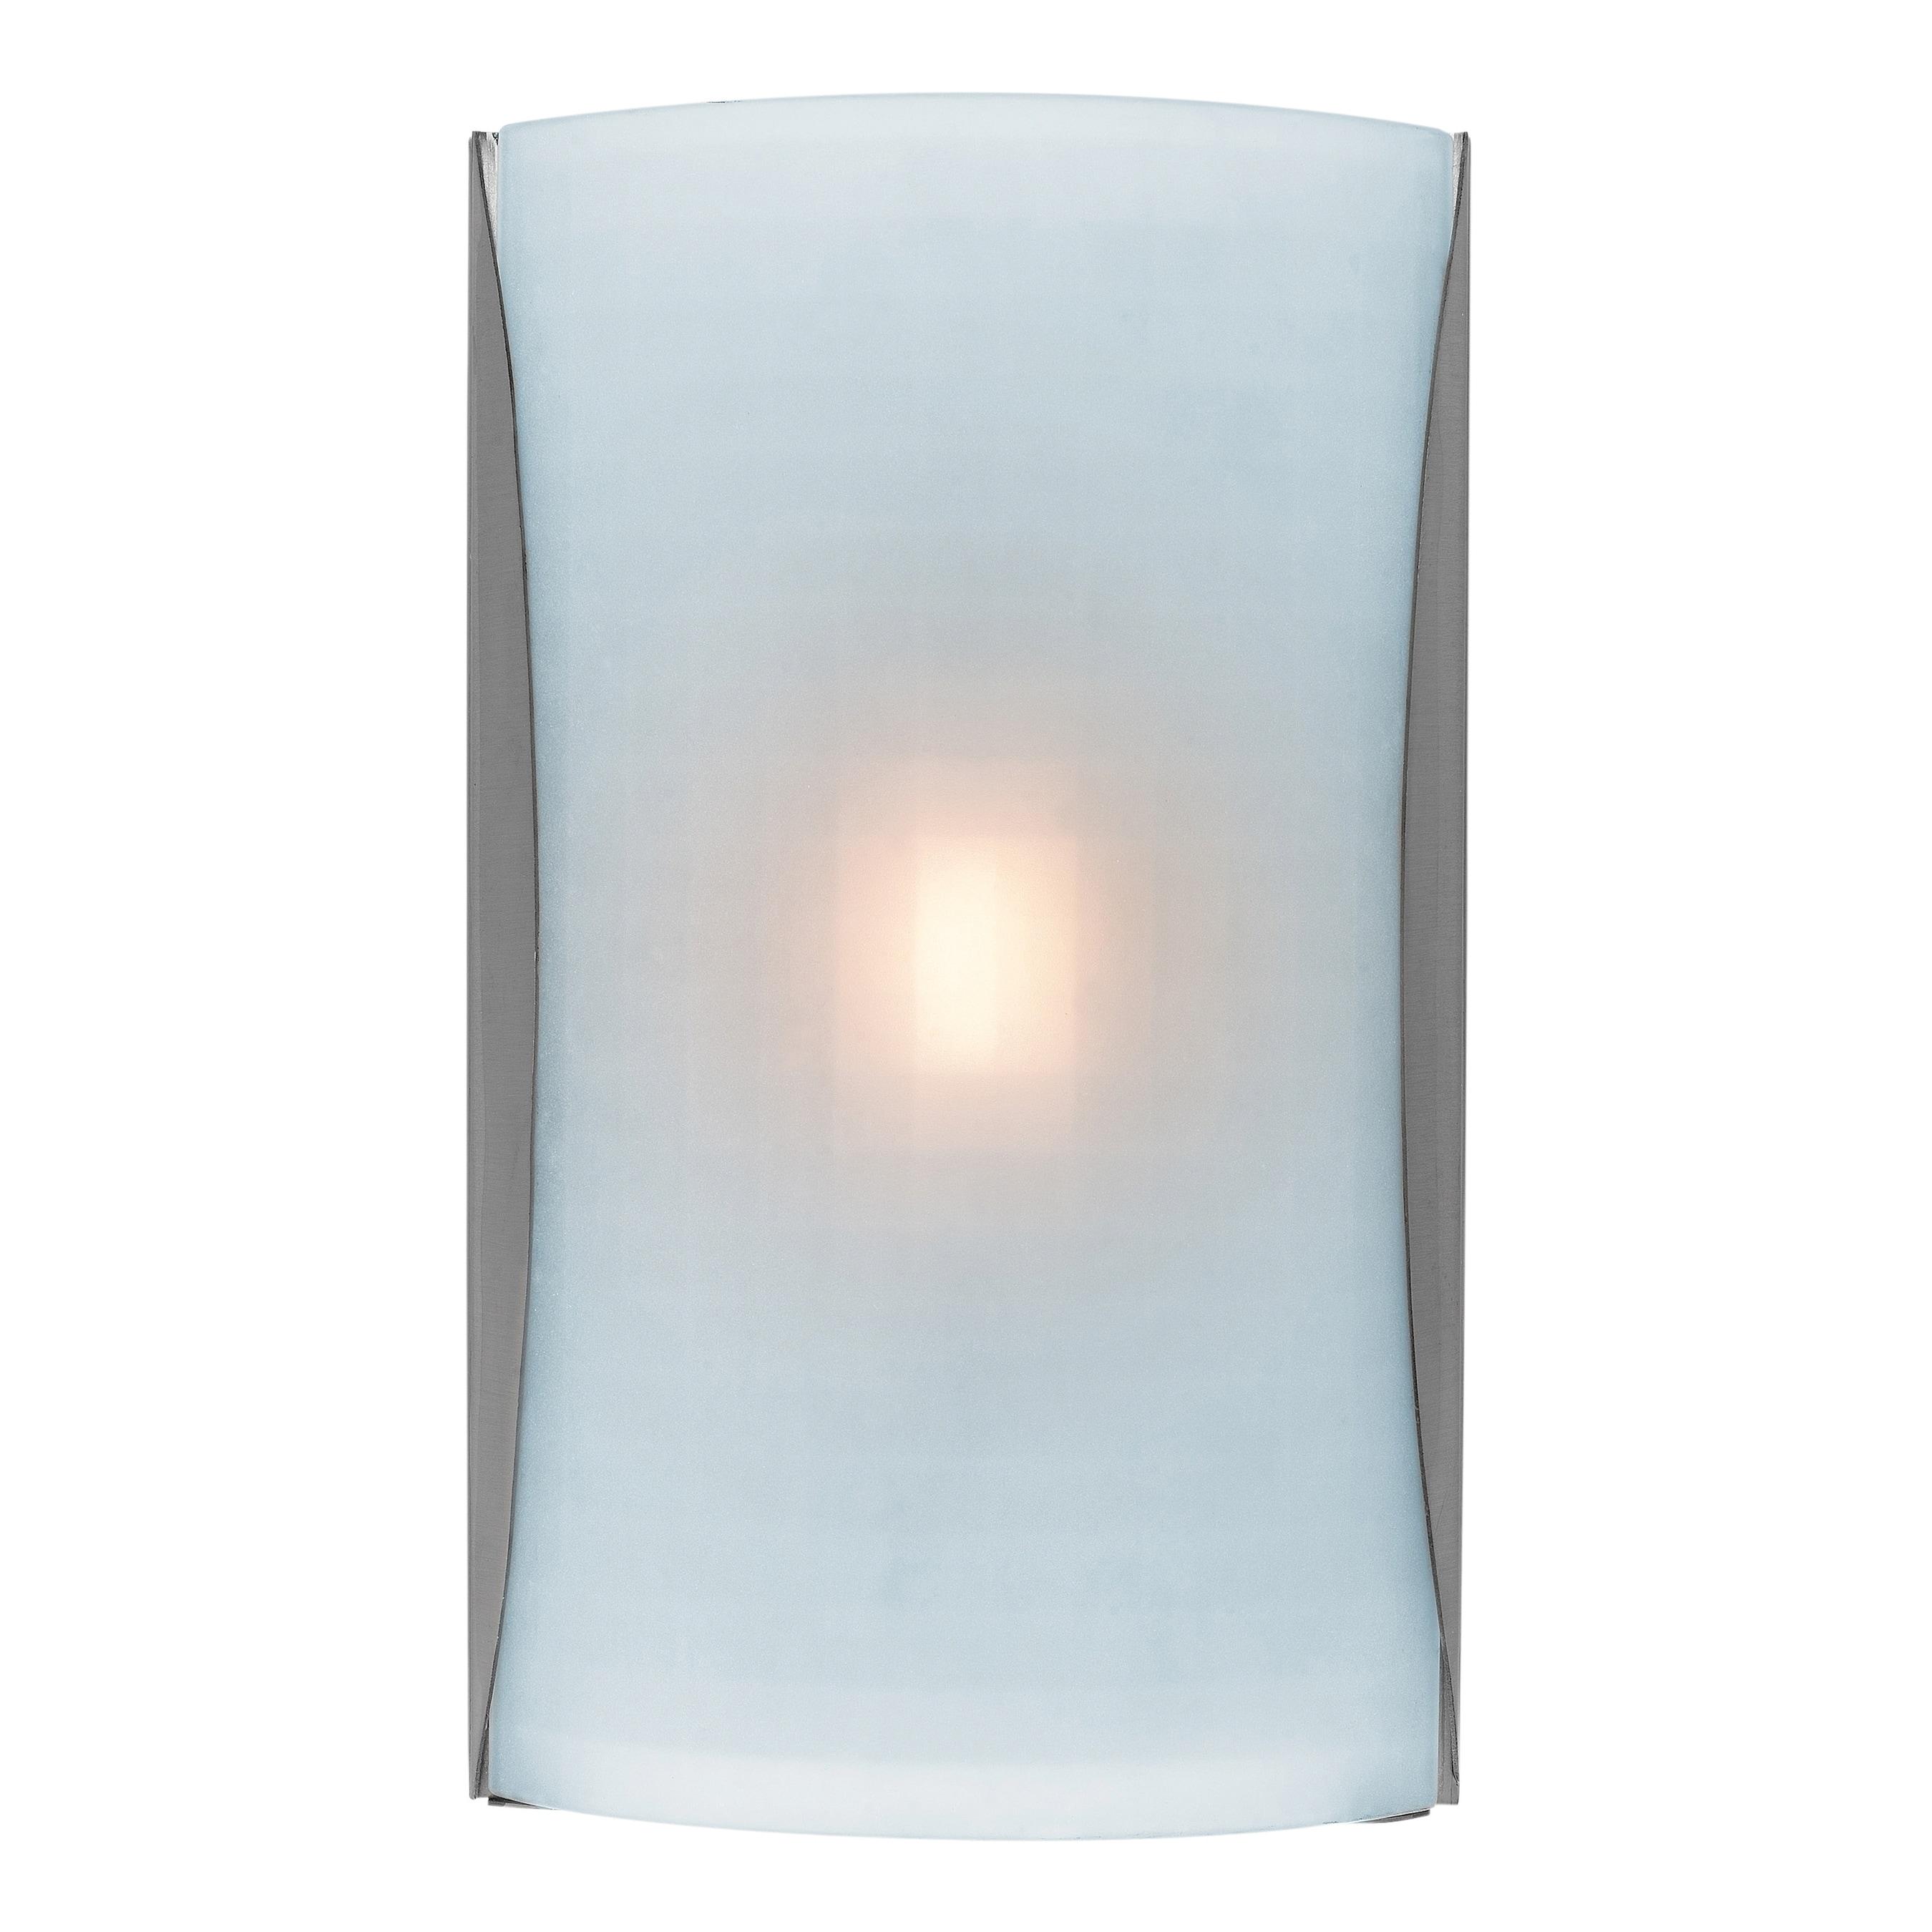 Access Lighting Radon 2-light Fluorescent Brushed Steel Wall Sconce ...